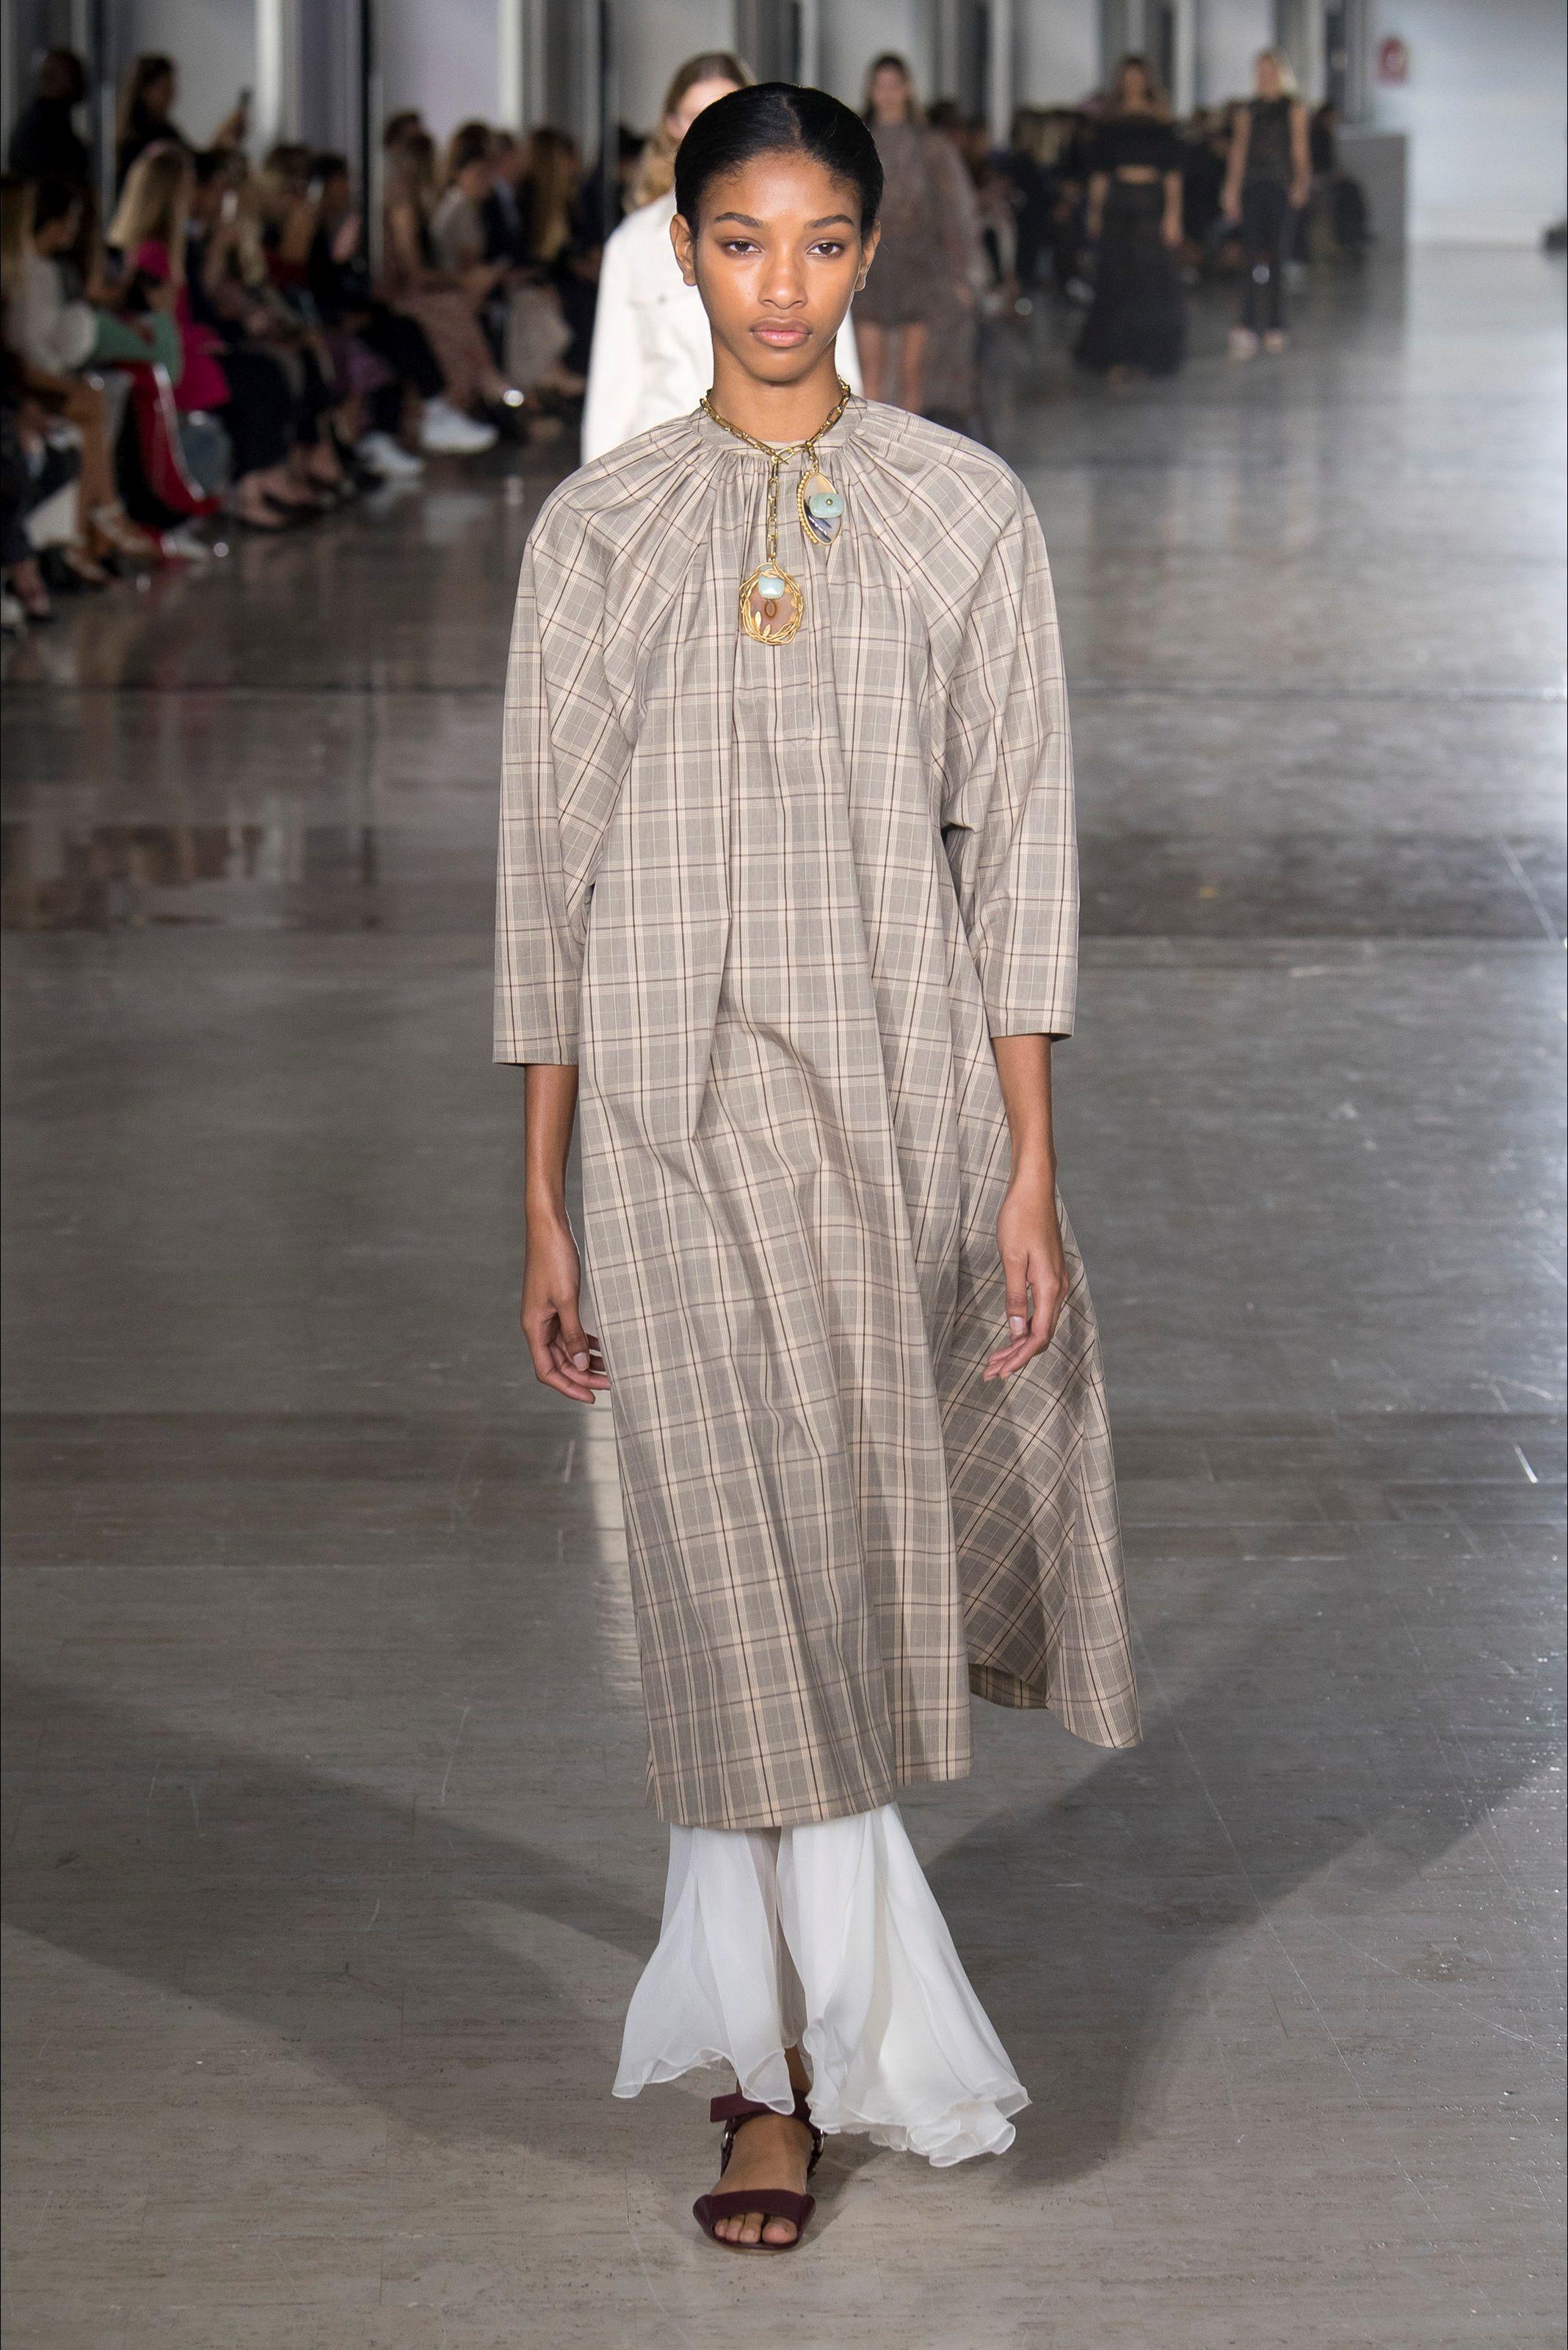 ca4d20b6074b Sfilata Giambattista Valli Parigi - Collezioni Primavera Estate 2019 - Vogue